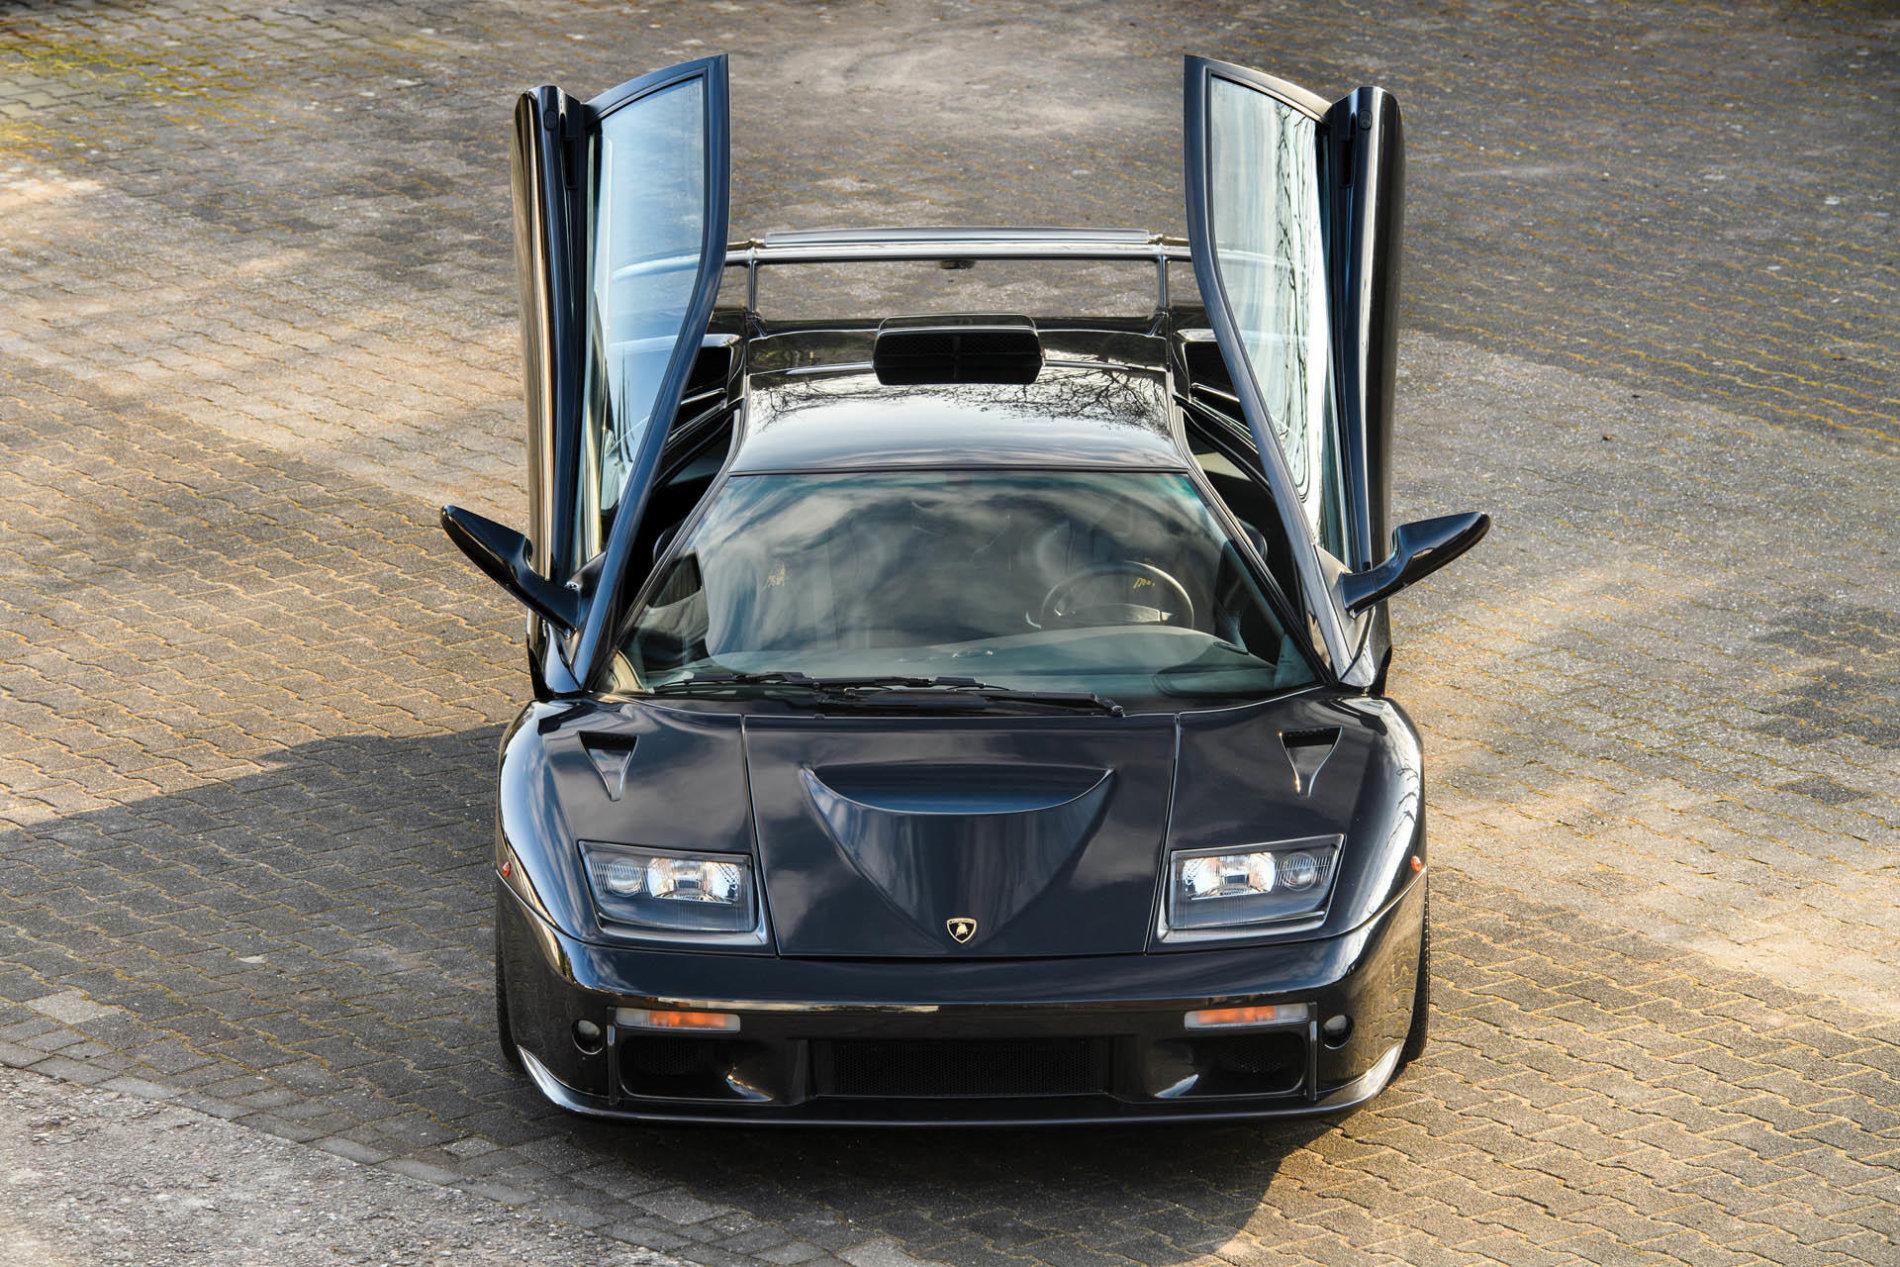 Lamborghini Diablo GT din 1999 - Lamborghini Diablo GT din 1999